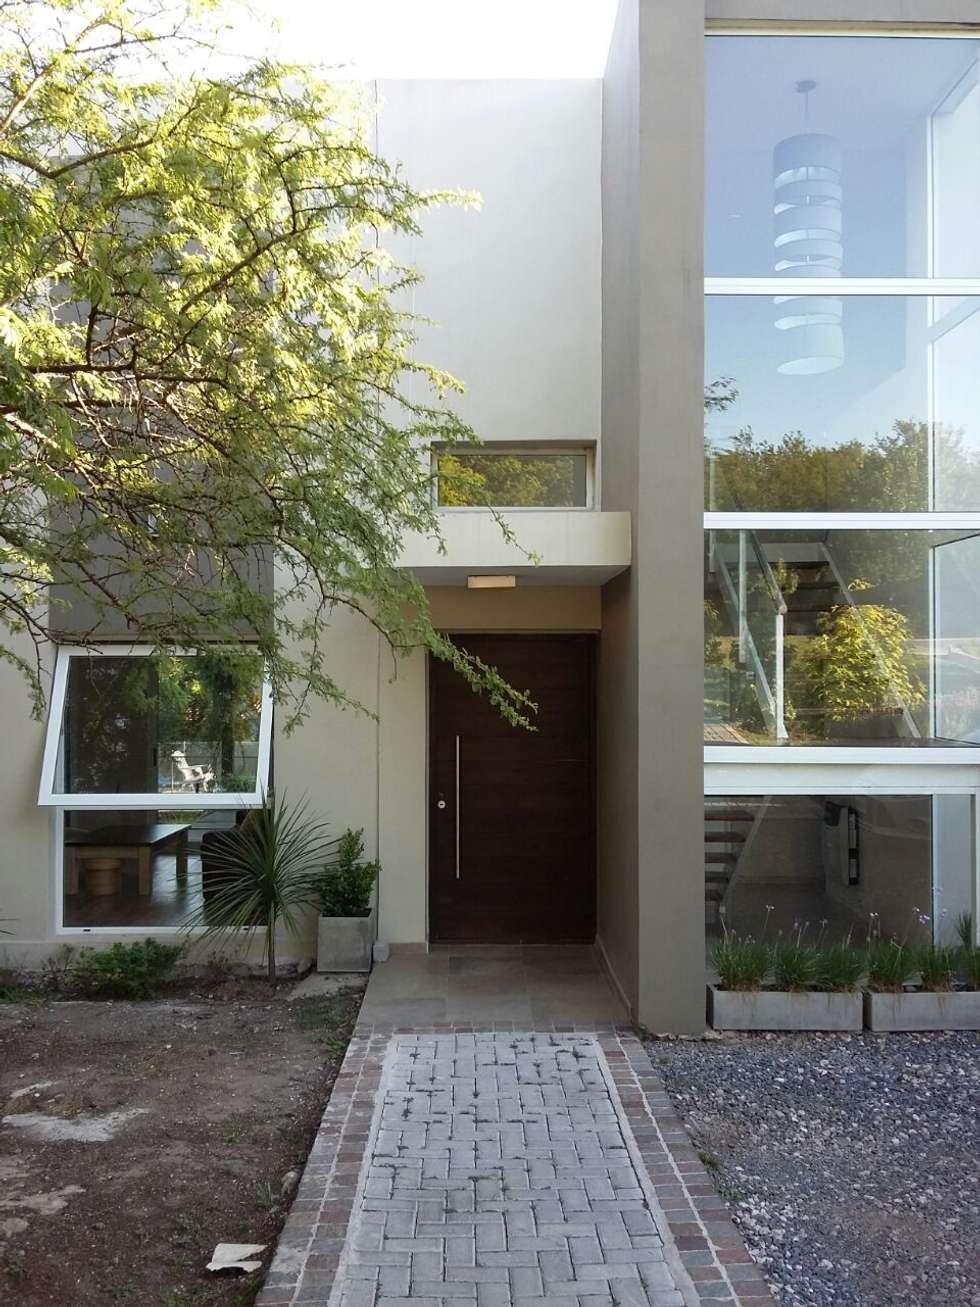 Ampliacion living: Casas de estilo moderno por LOSADA ARQUITECTURA